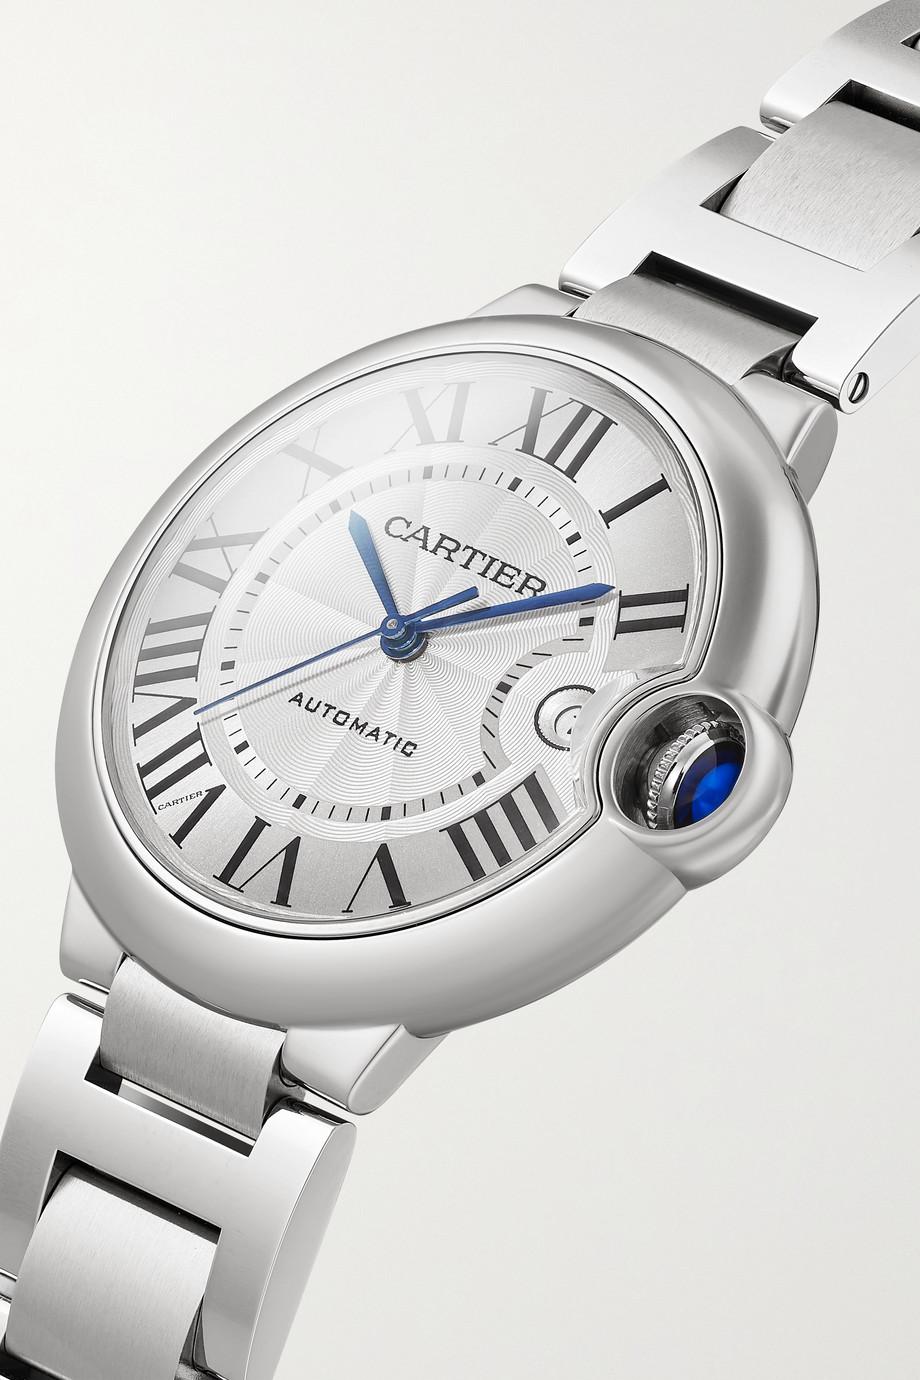 Cartier Ballon Bleu de Cartier Automatic 39 mm Uhr aus Edelstahl